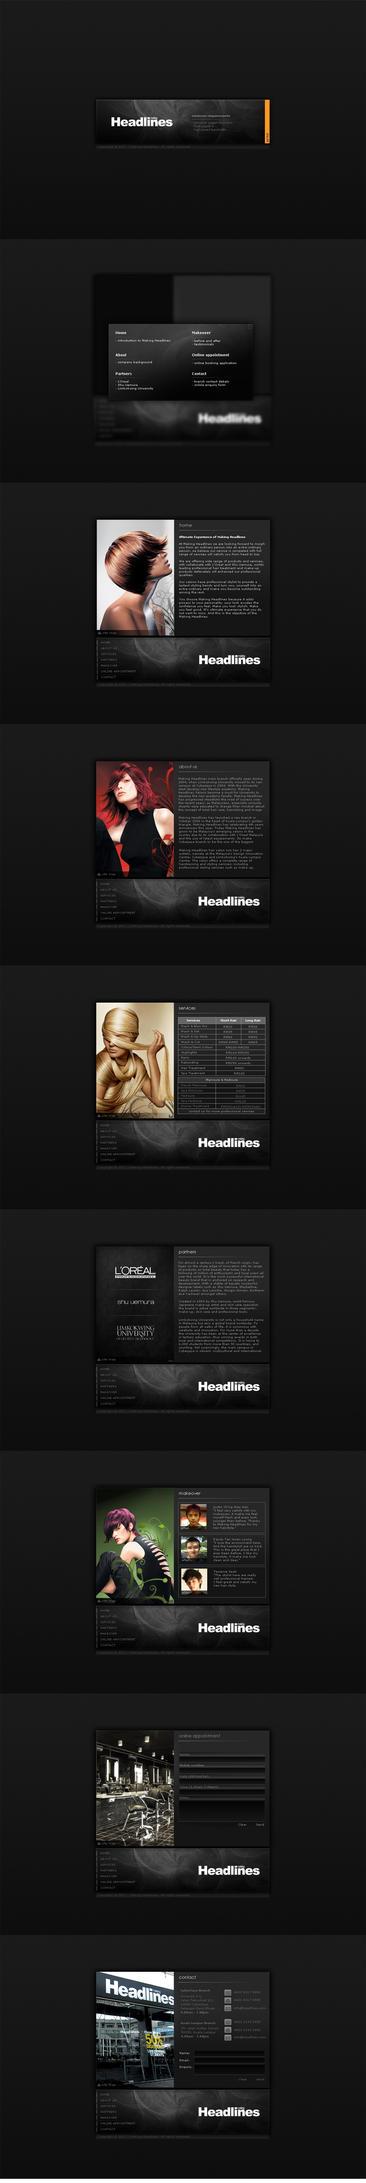 Headlines Final by teddylife